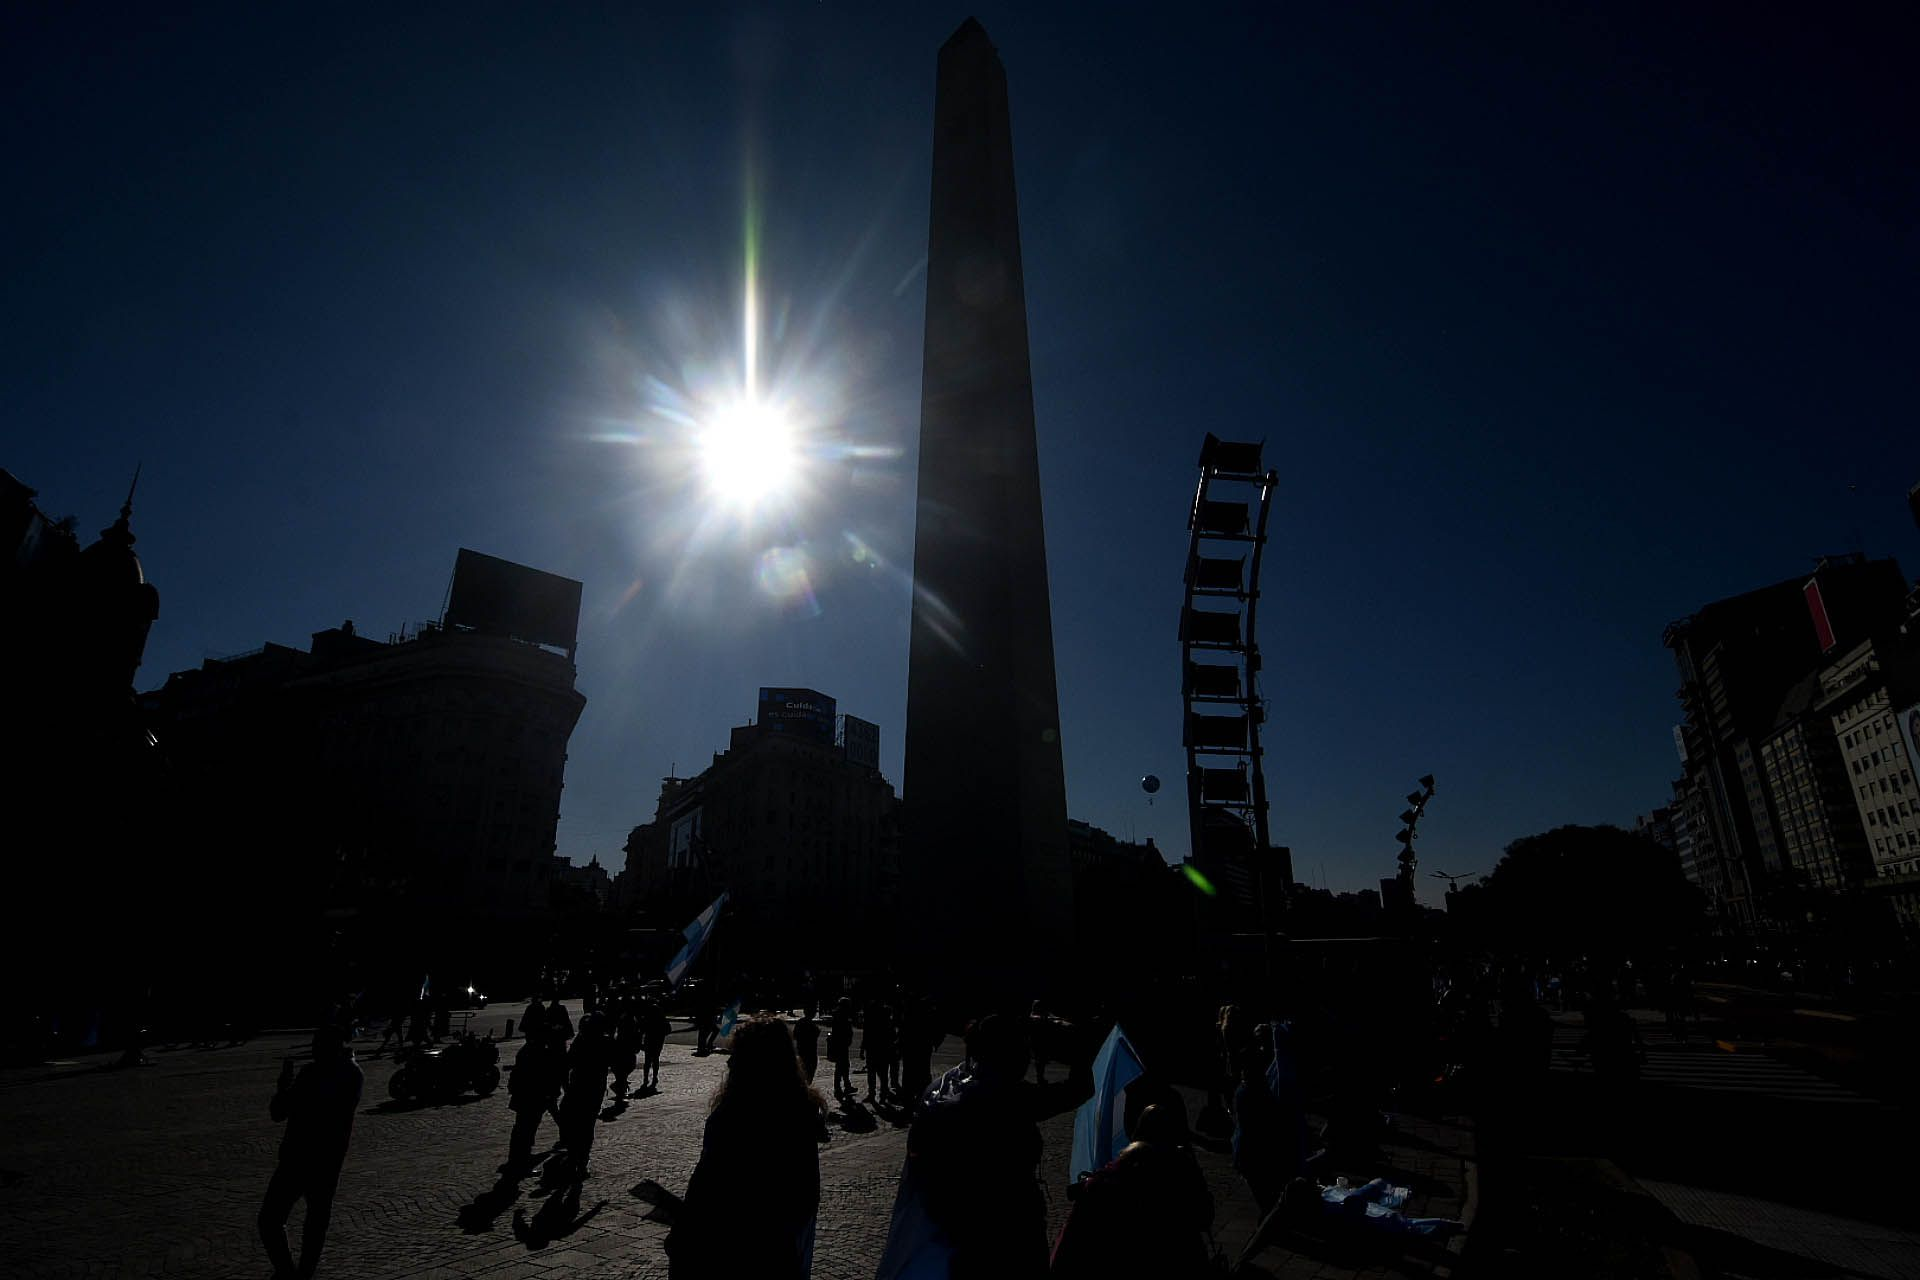 Banderazo - marcha 17A Obelisco